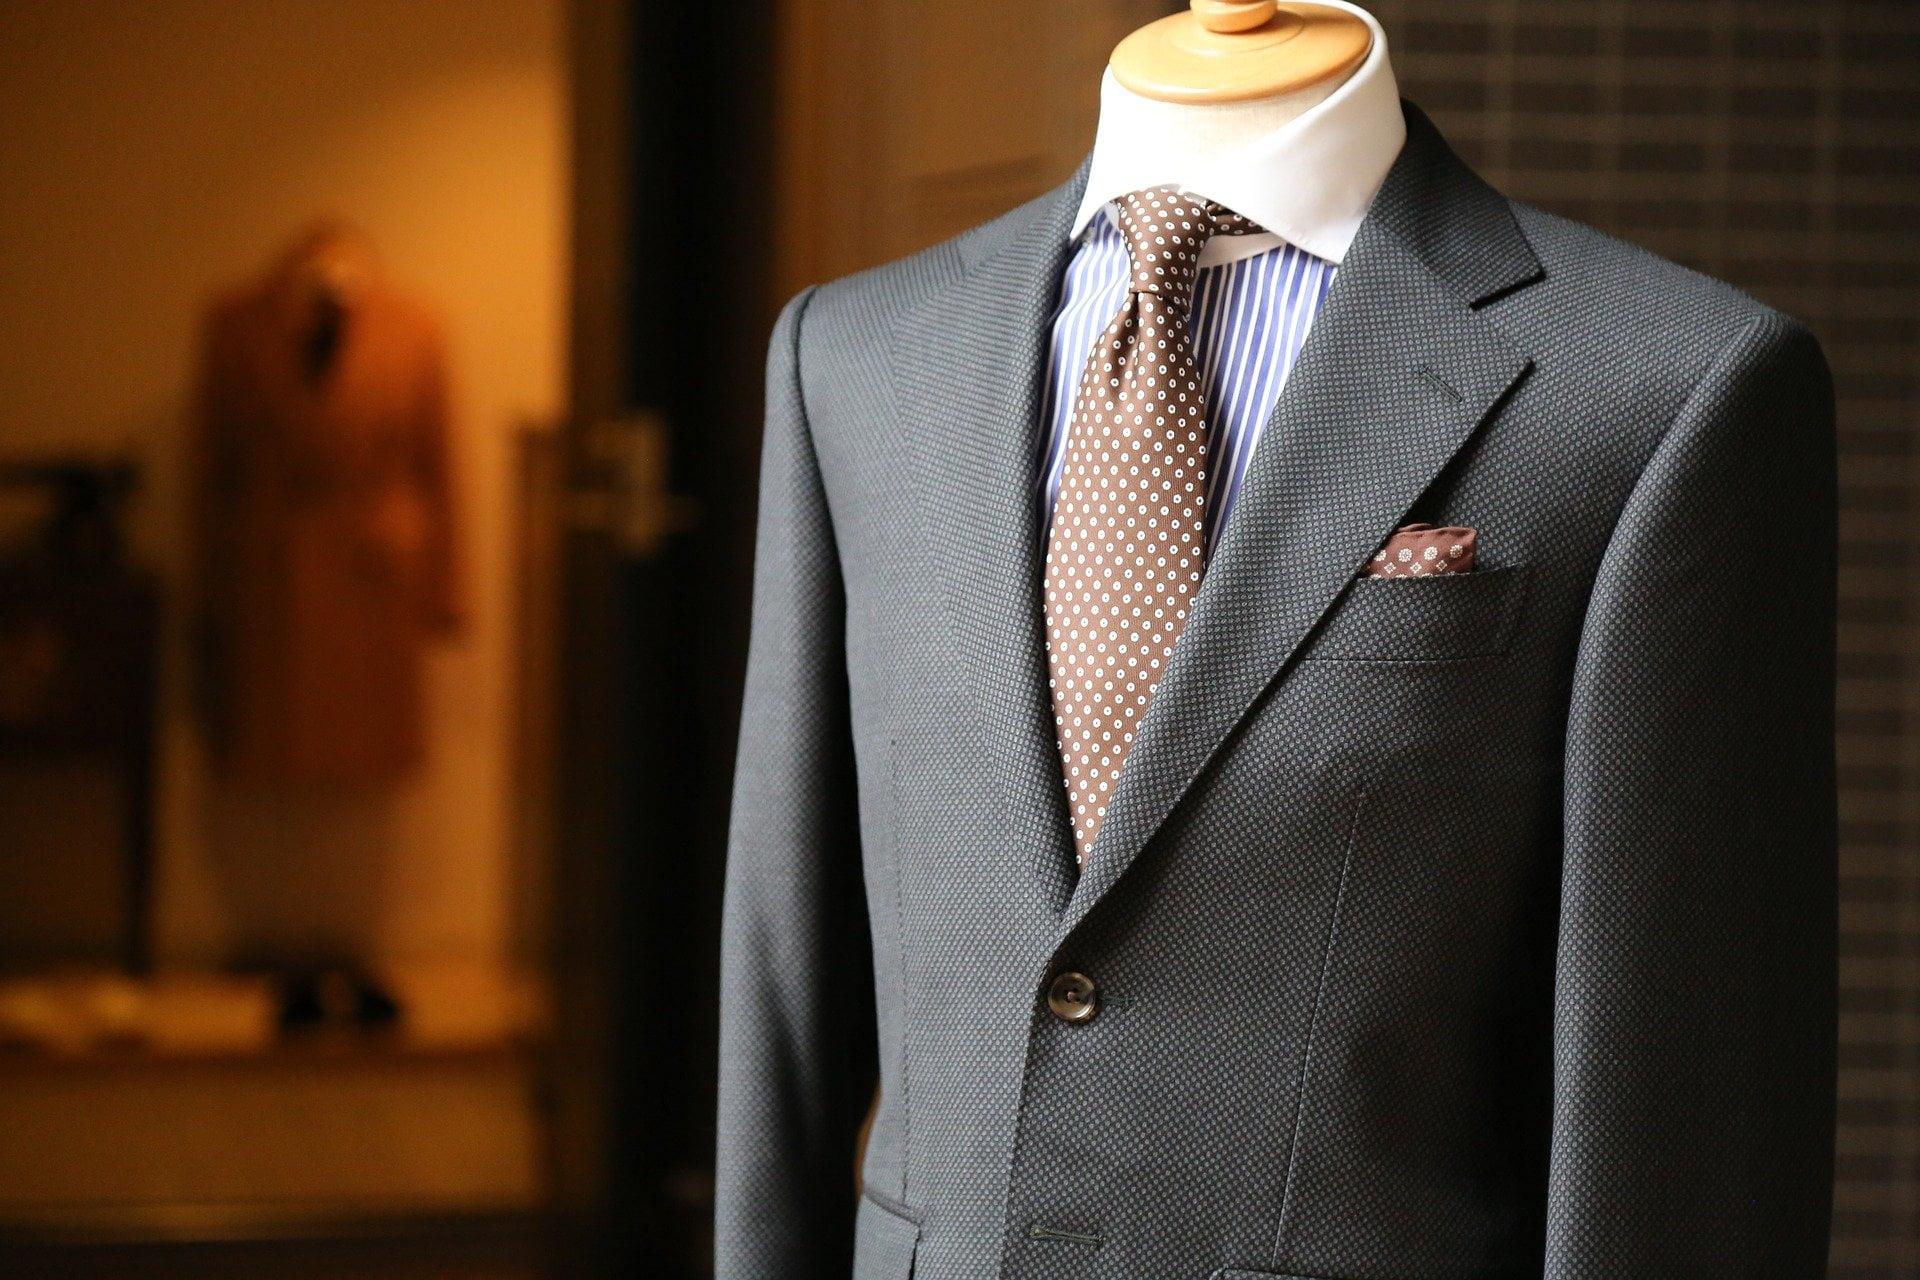 Jaki skład powinien mieć garnitur?